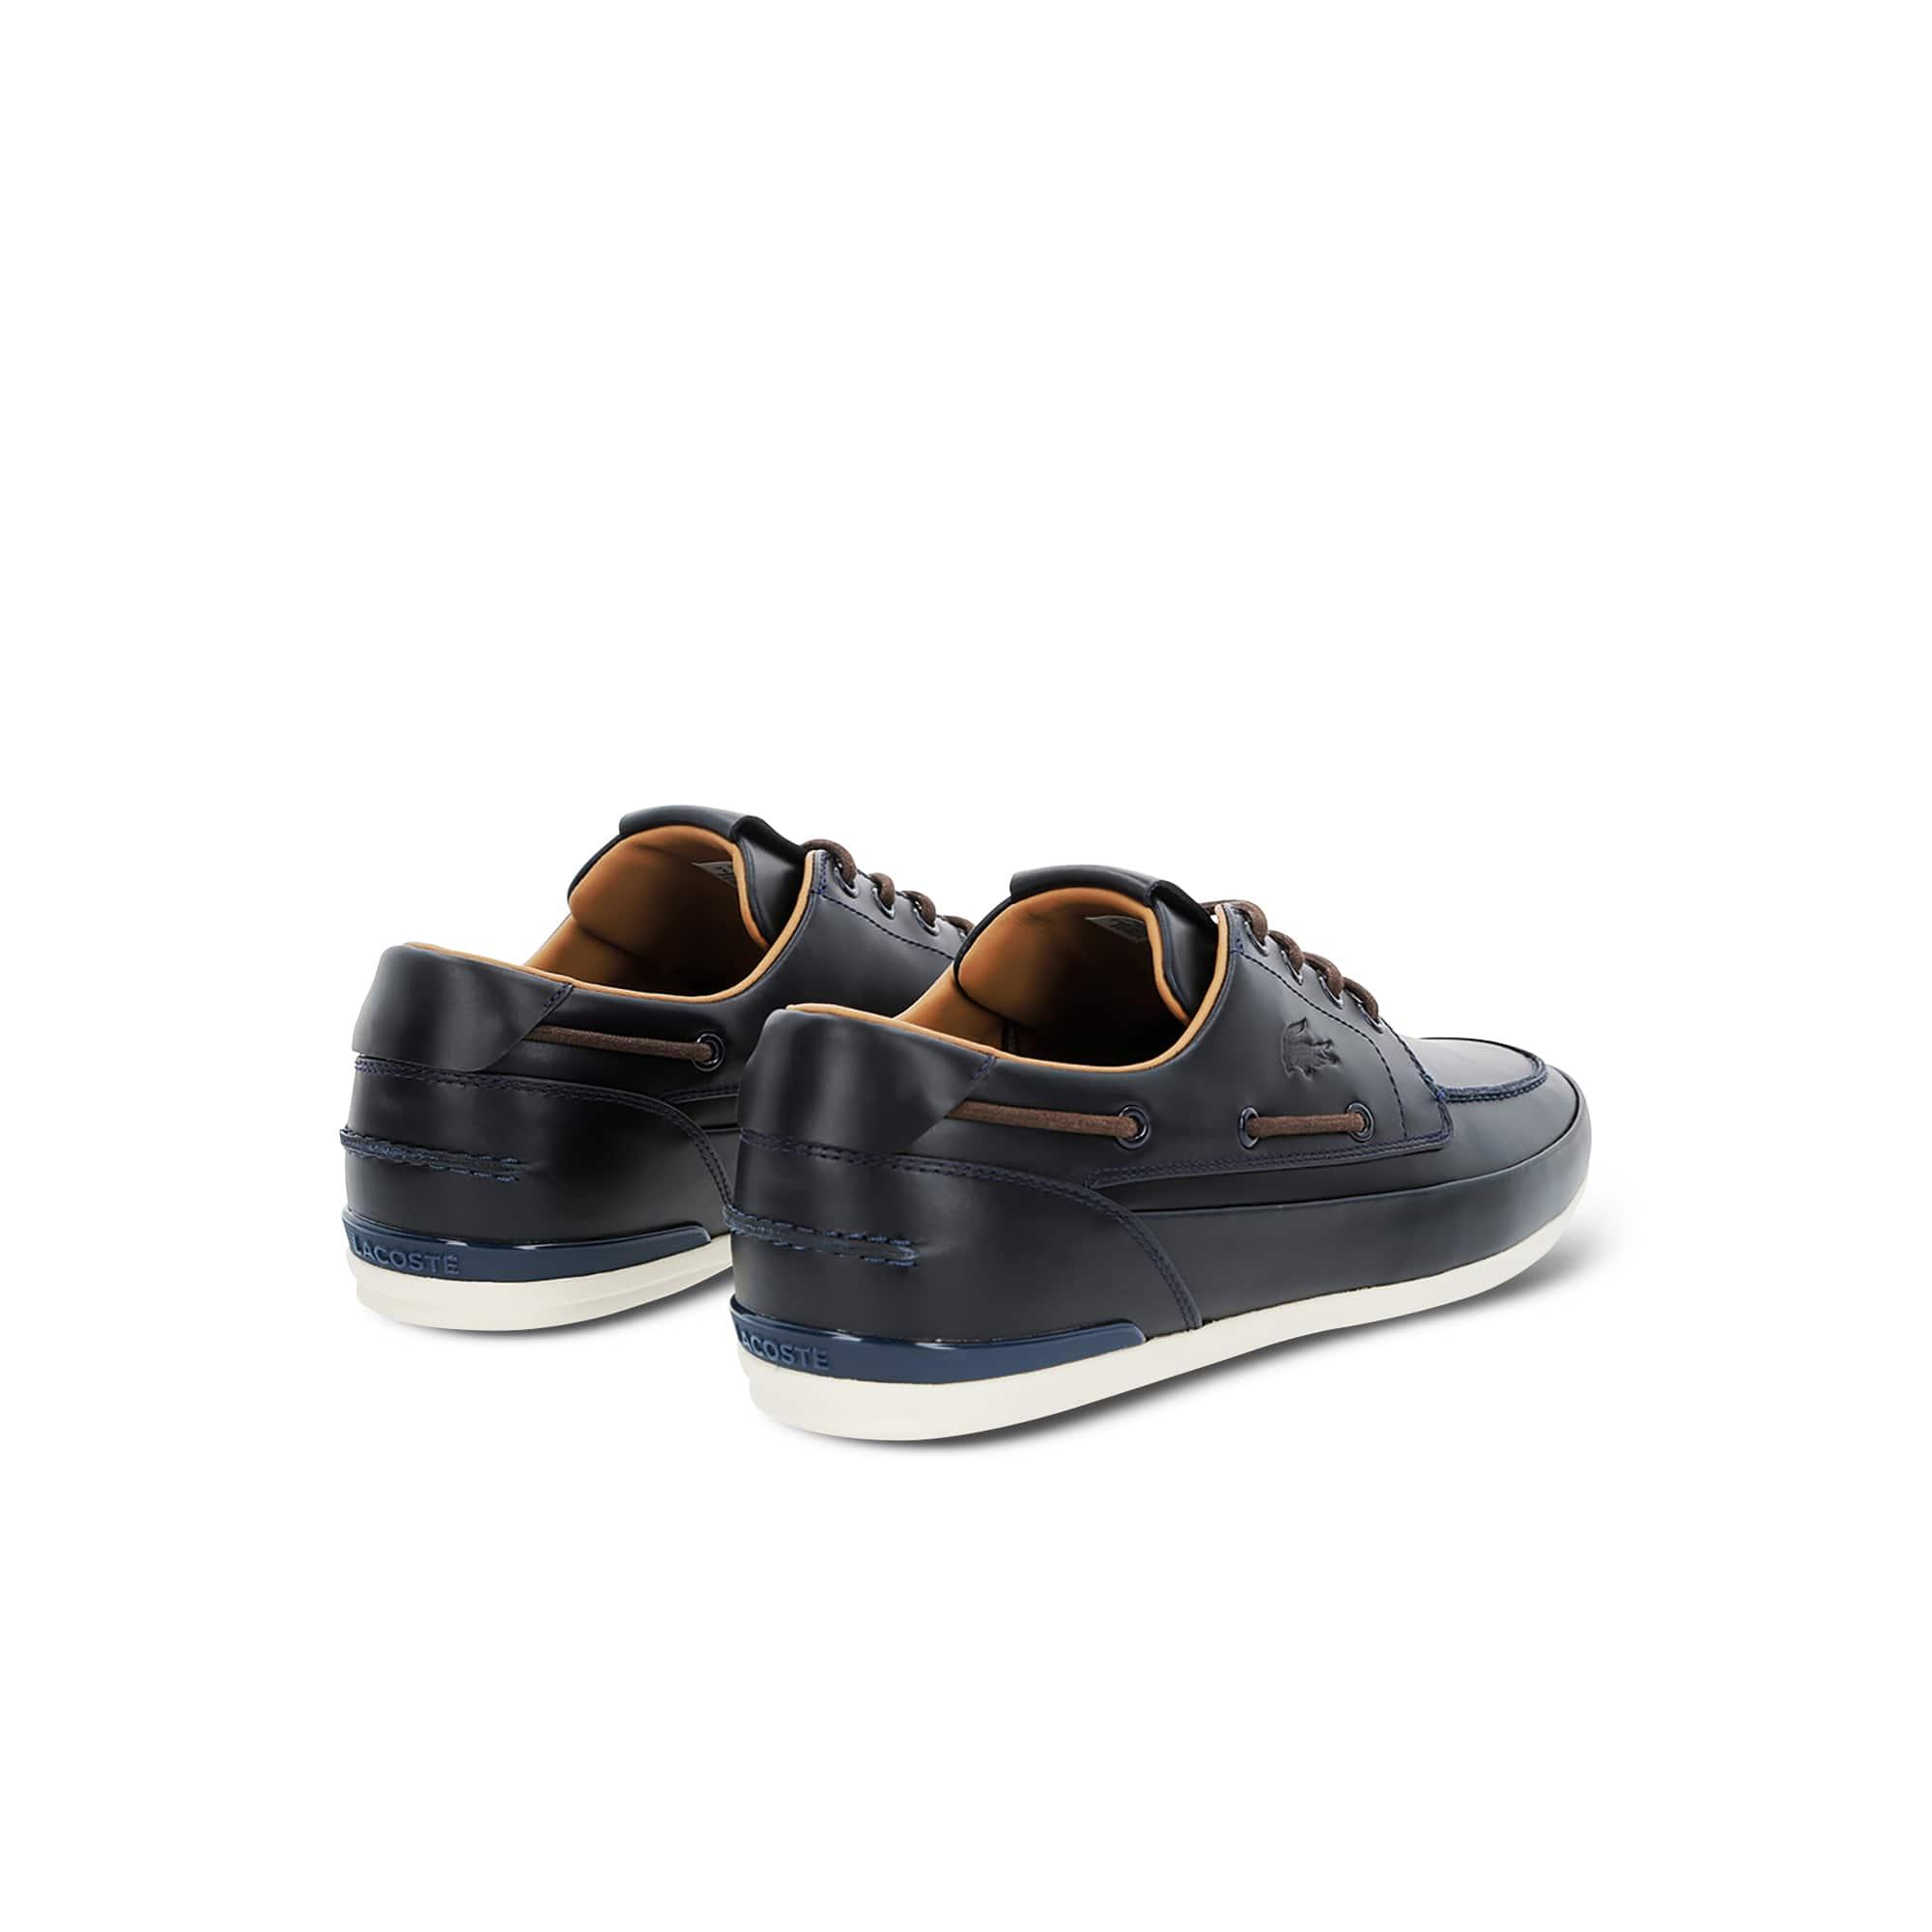 Marina Premium Leather Deck Shoes | LACOSTE